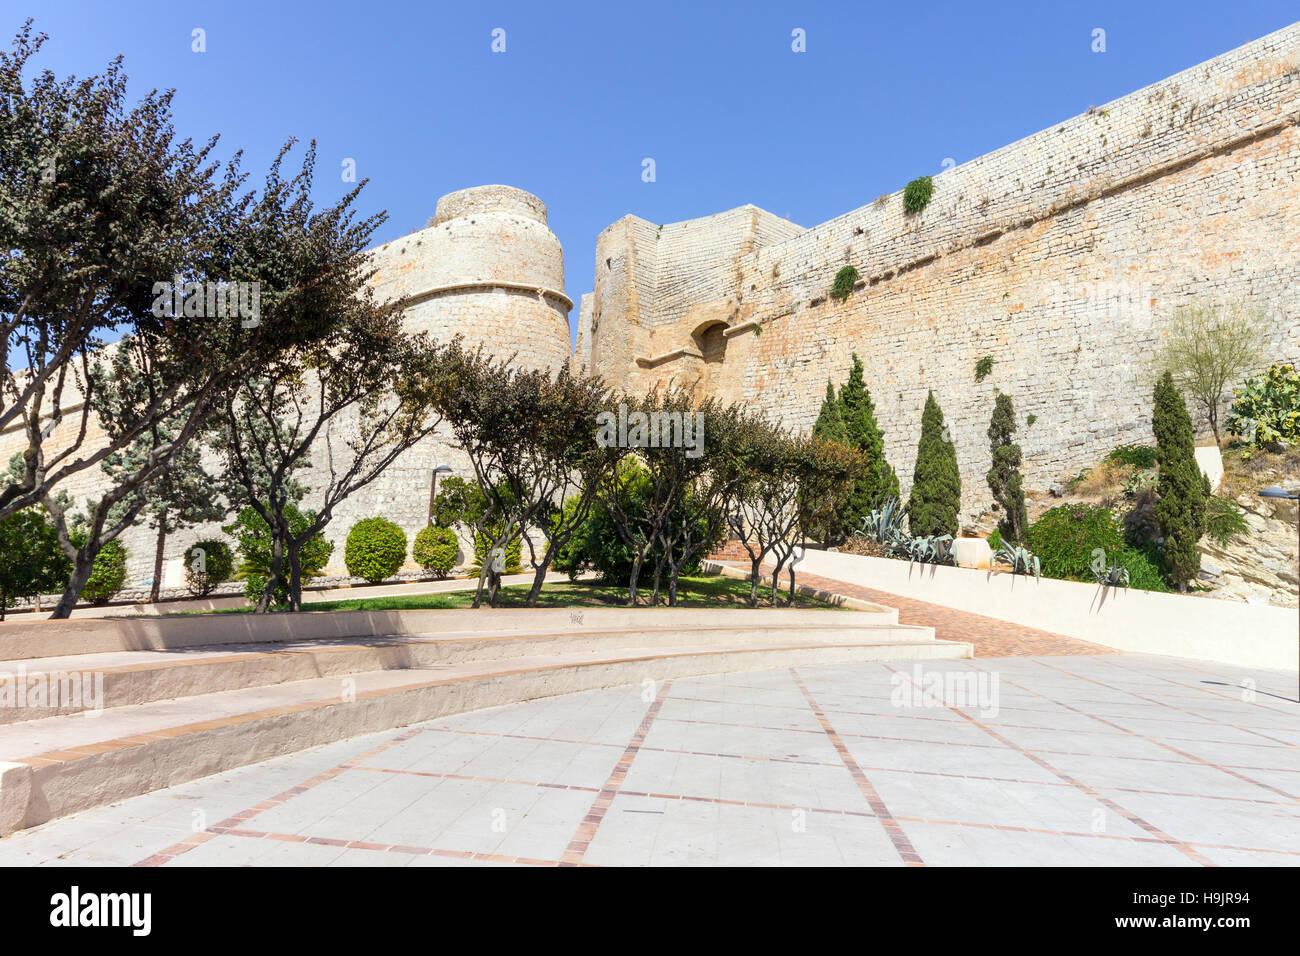 Spain, Balearic Islands, Ibiza, Eivissa, Reina Sofia park - Stock Image